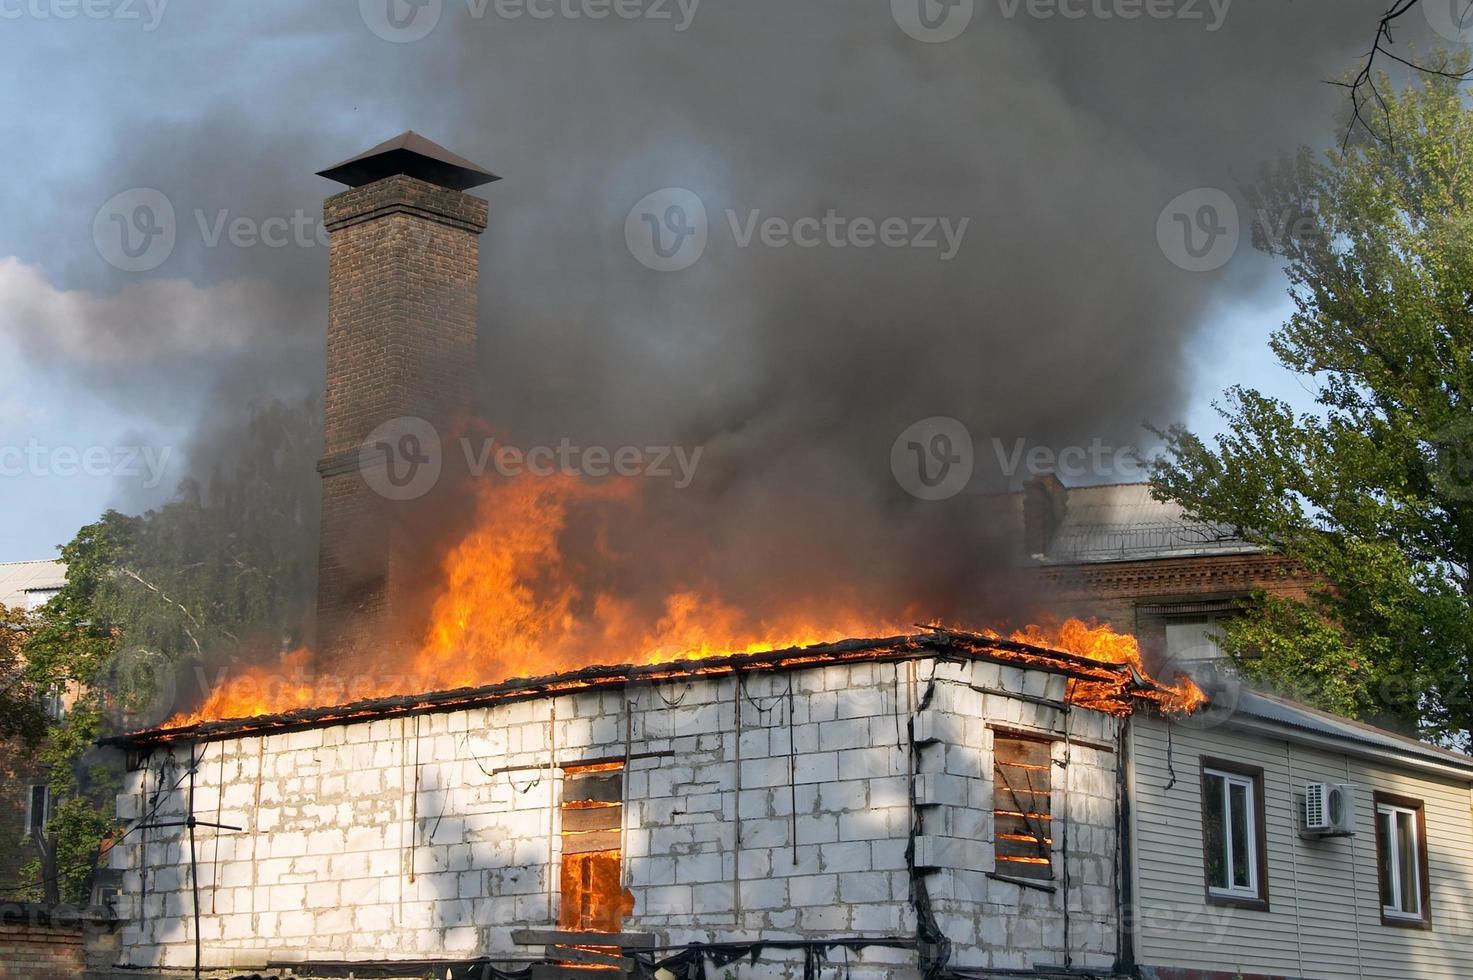 casa in fiamme foto